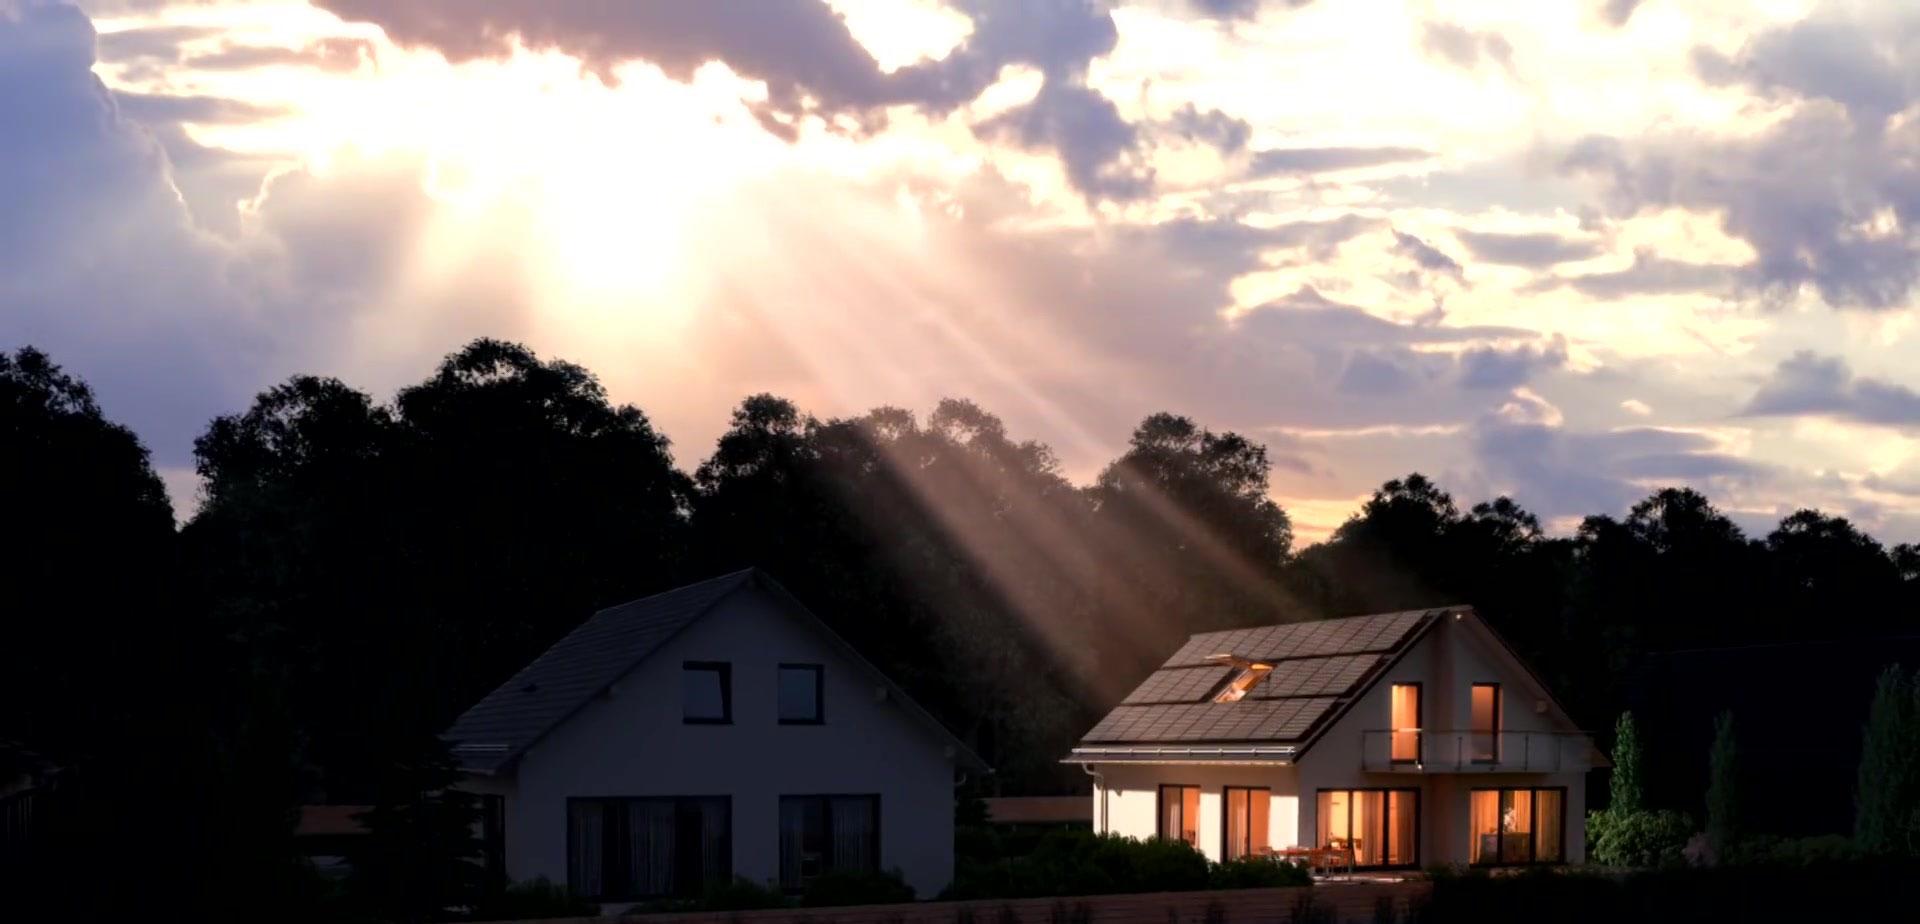 stromspeicher myreserve 2 2 die neue energie. Black Bedroom Furniture Sets. Home Design Ideas